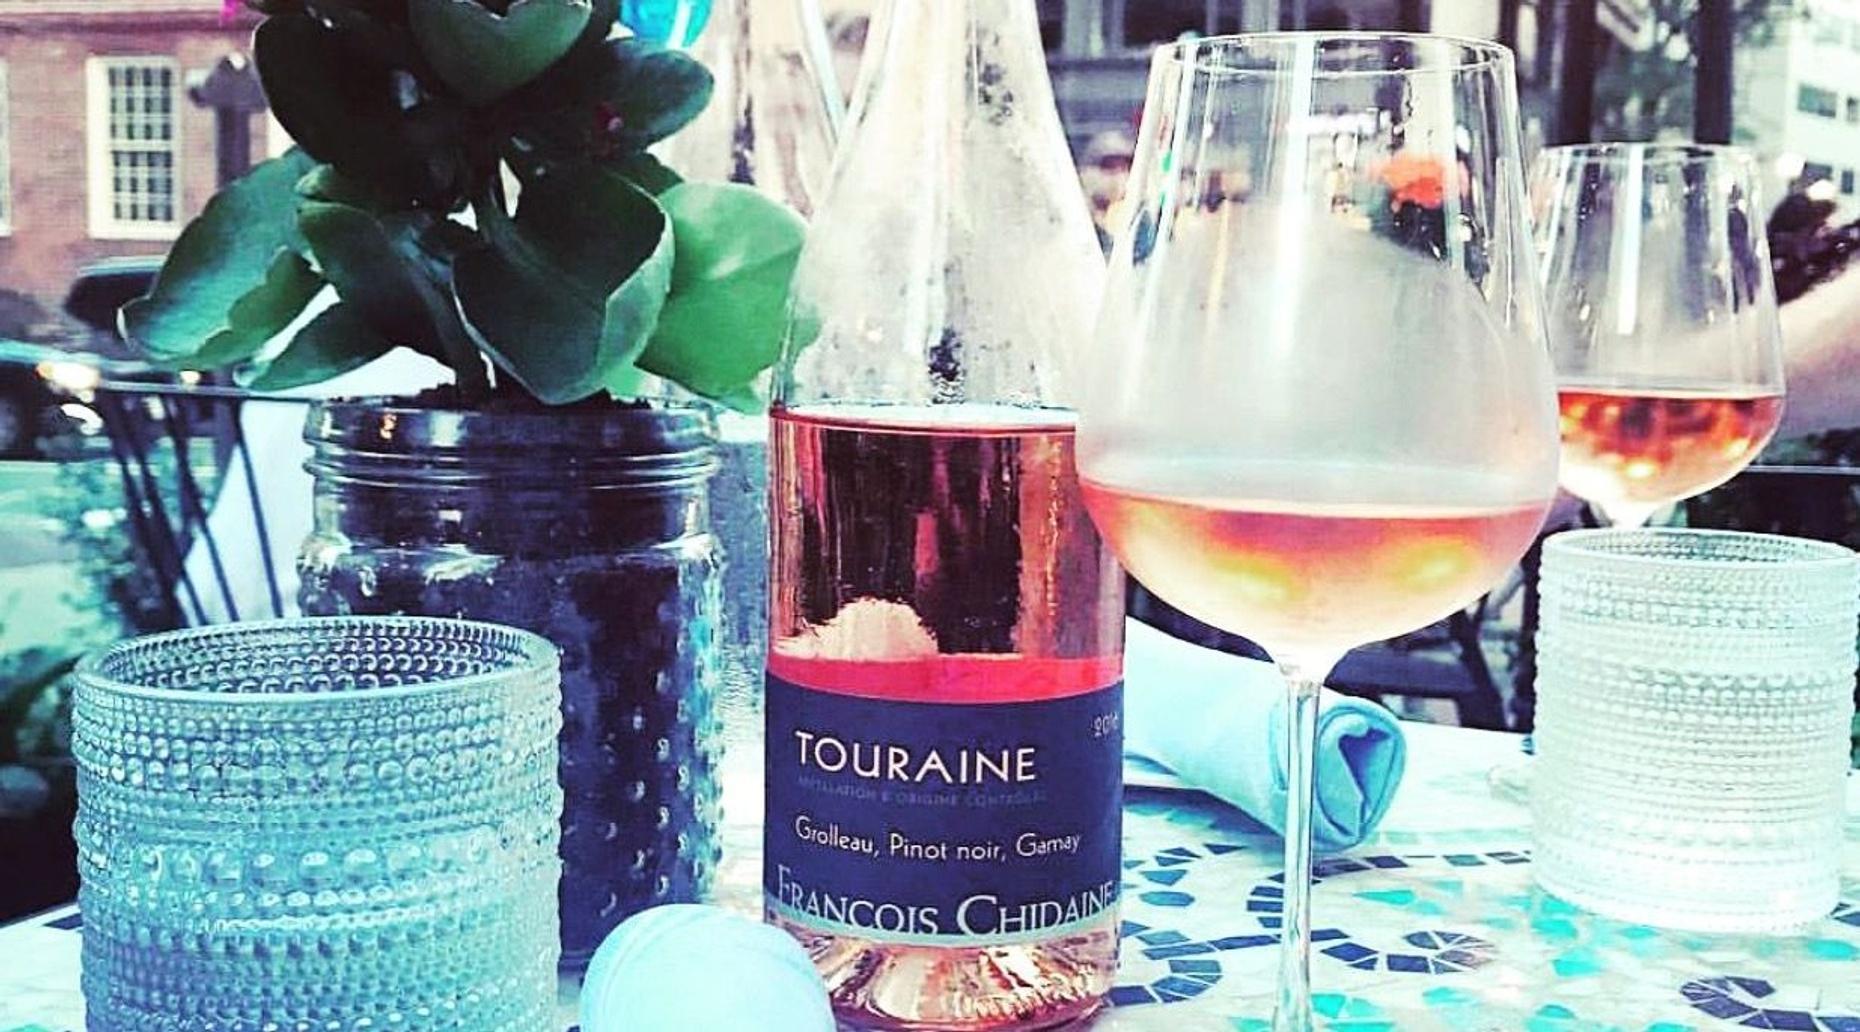 All-Day Rosé Wine Tour in Boston